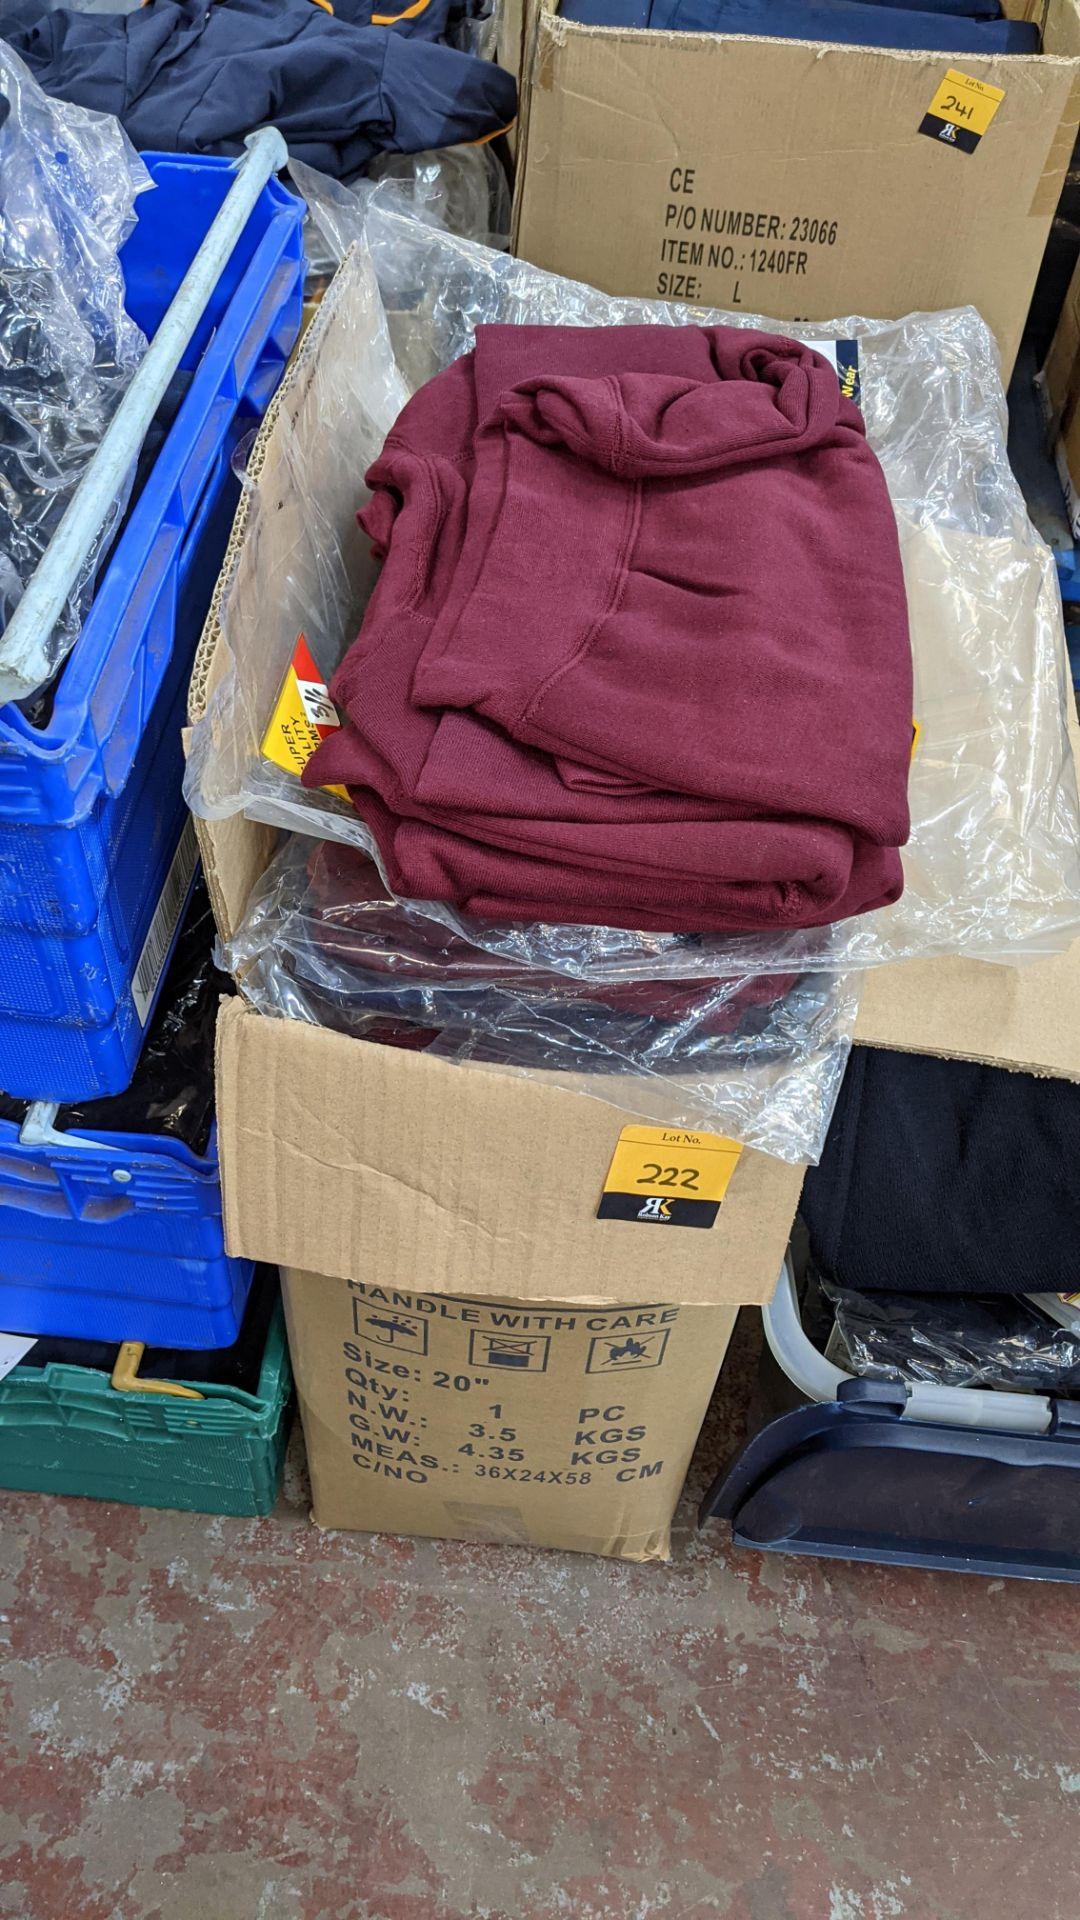 Approx 36 off children's burgundy sweatshirts - 1 large box